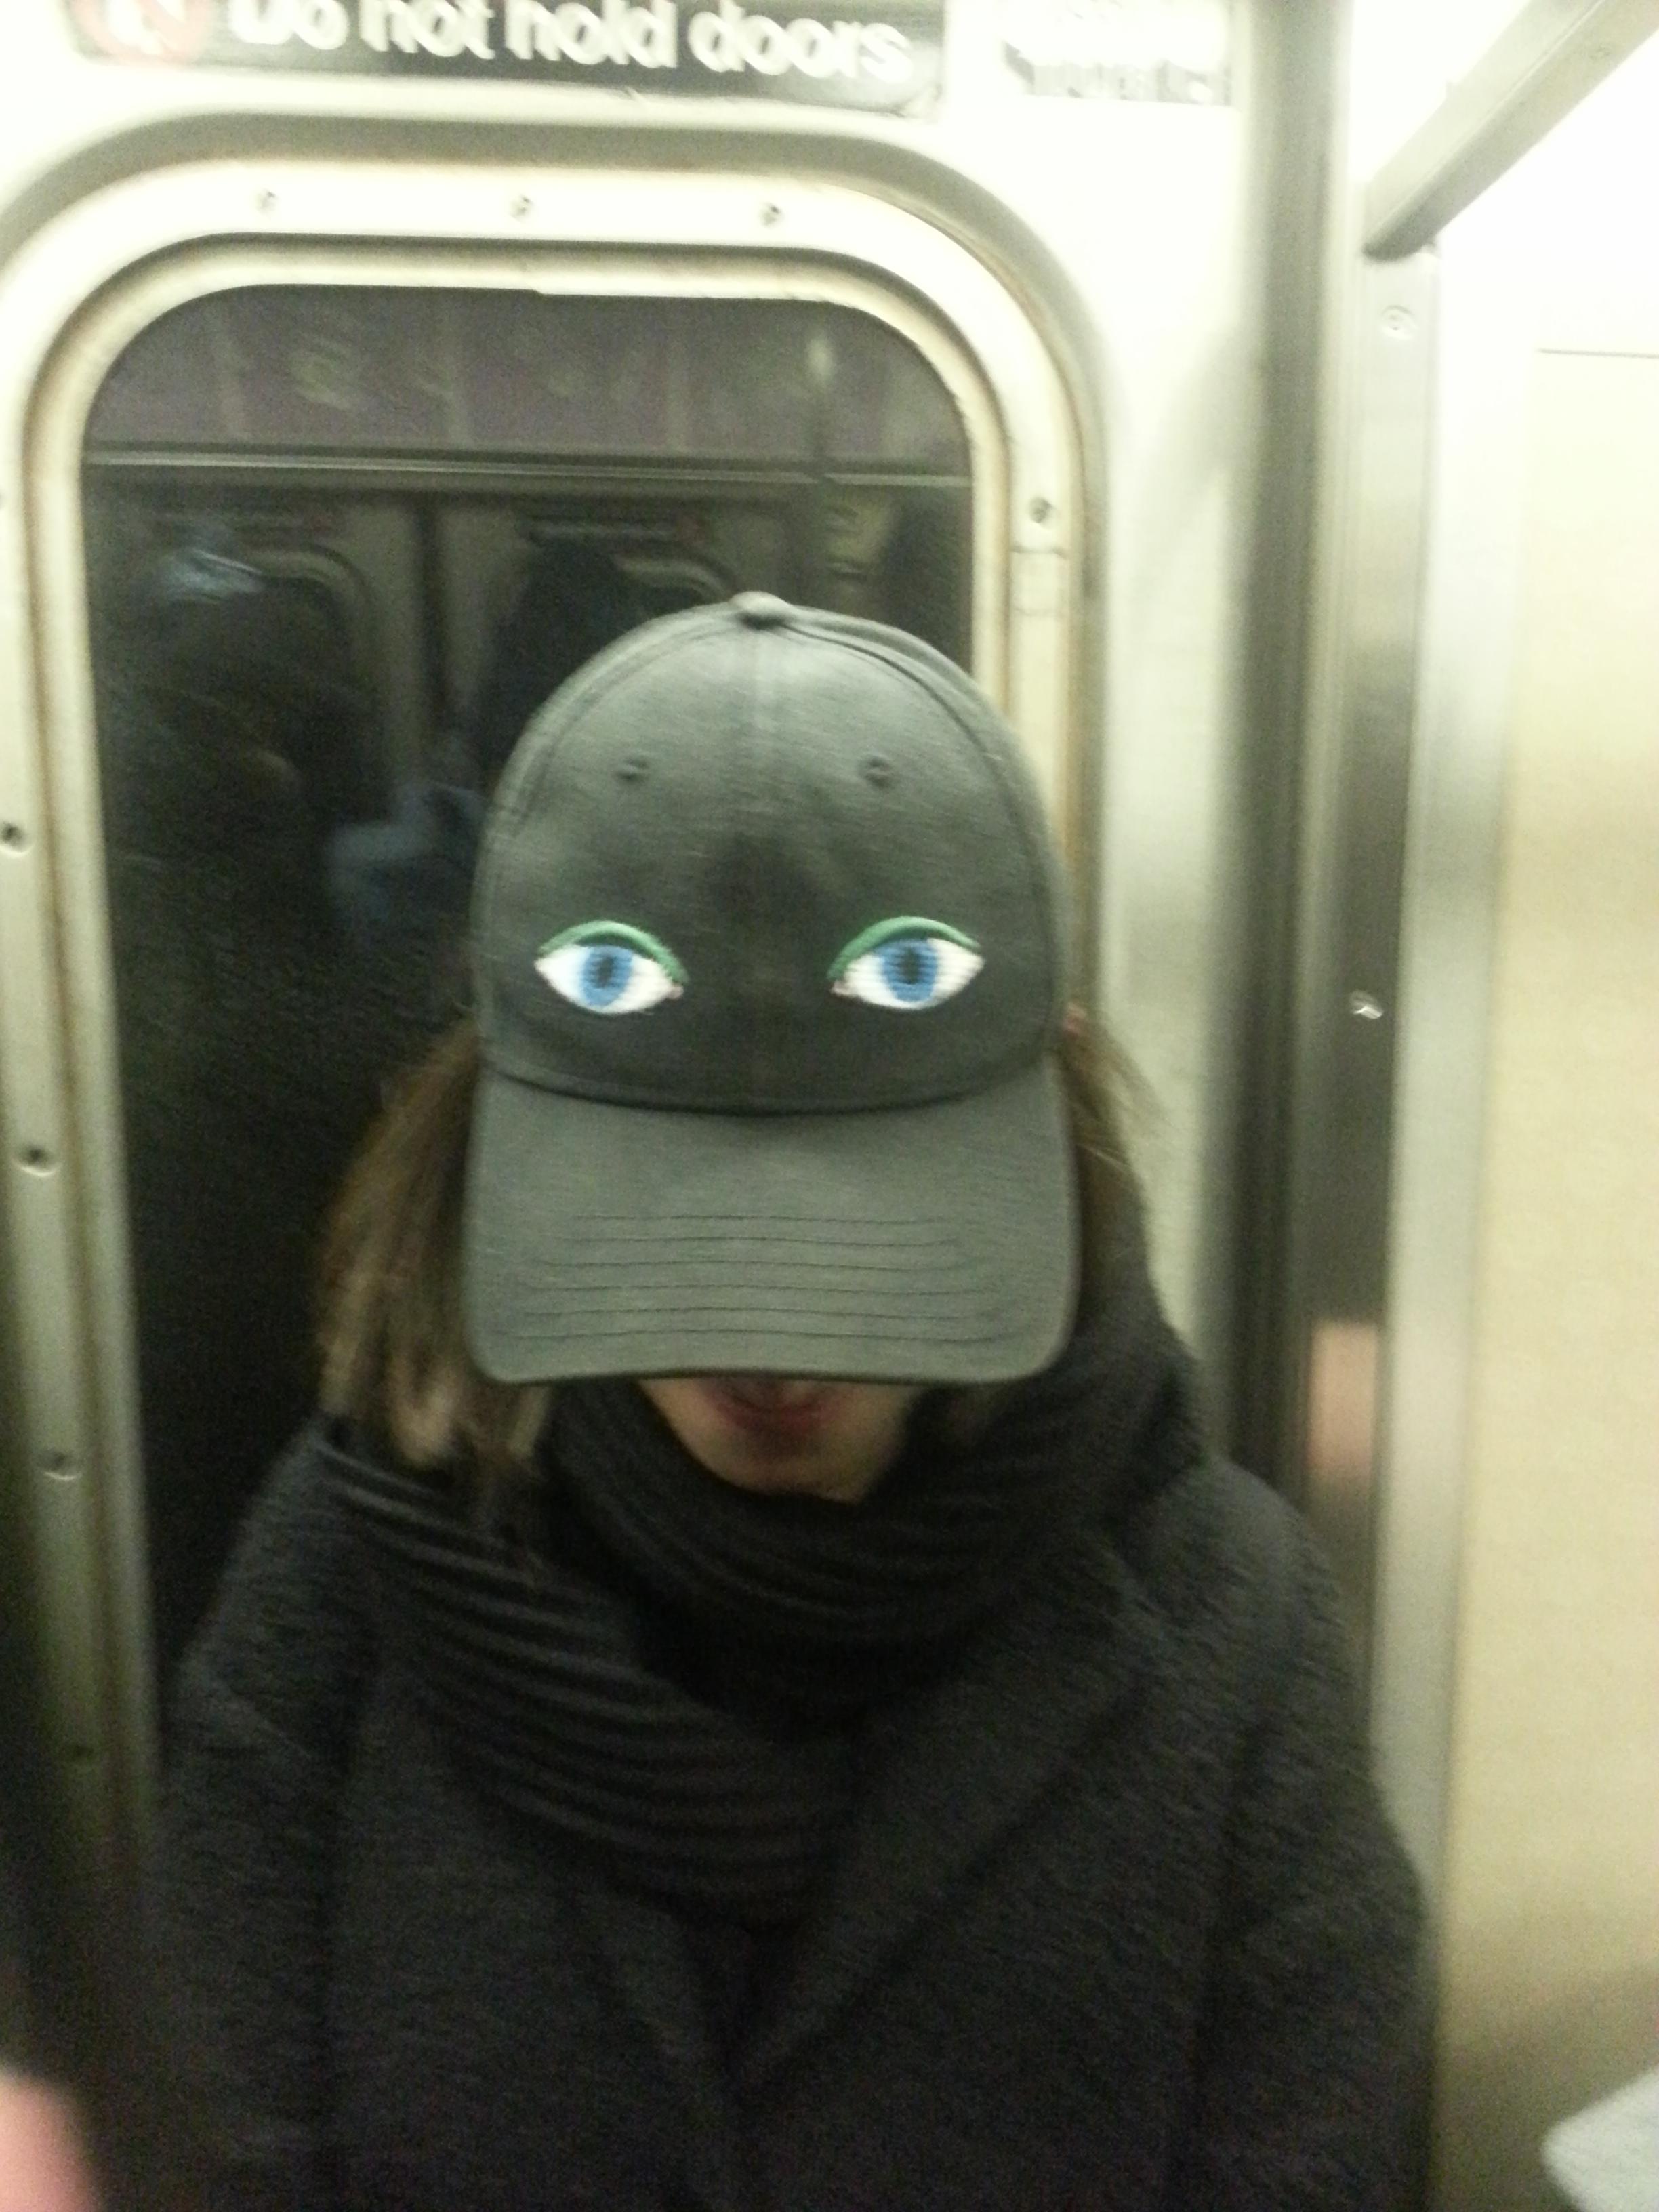 eye-m-watching-u